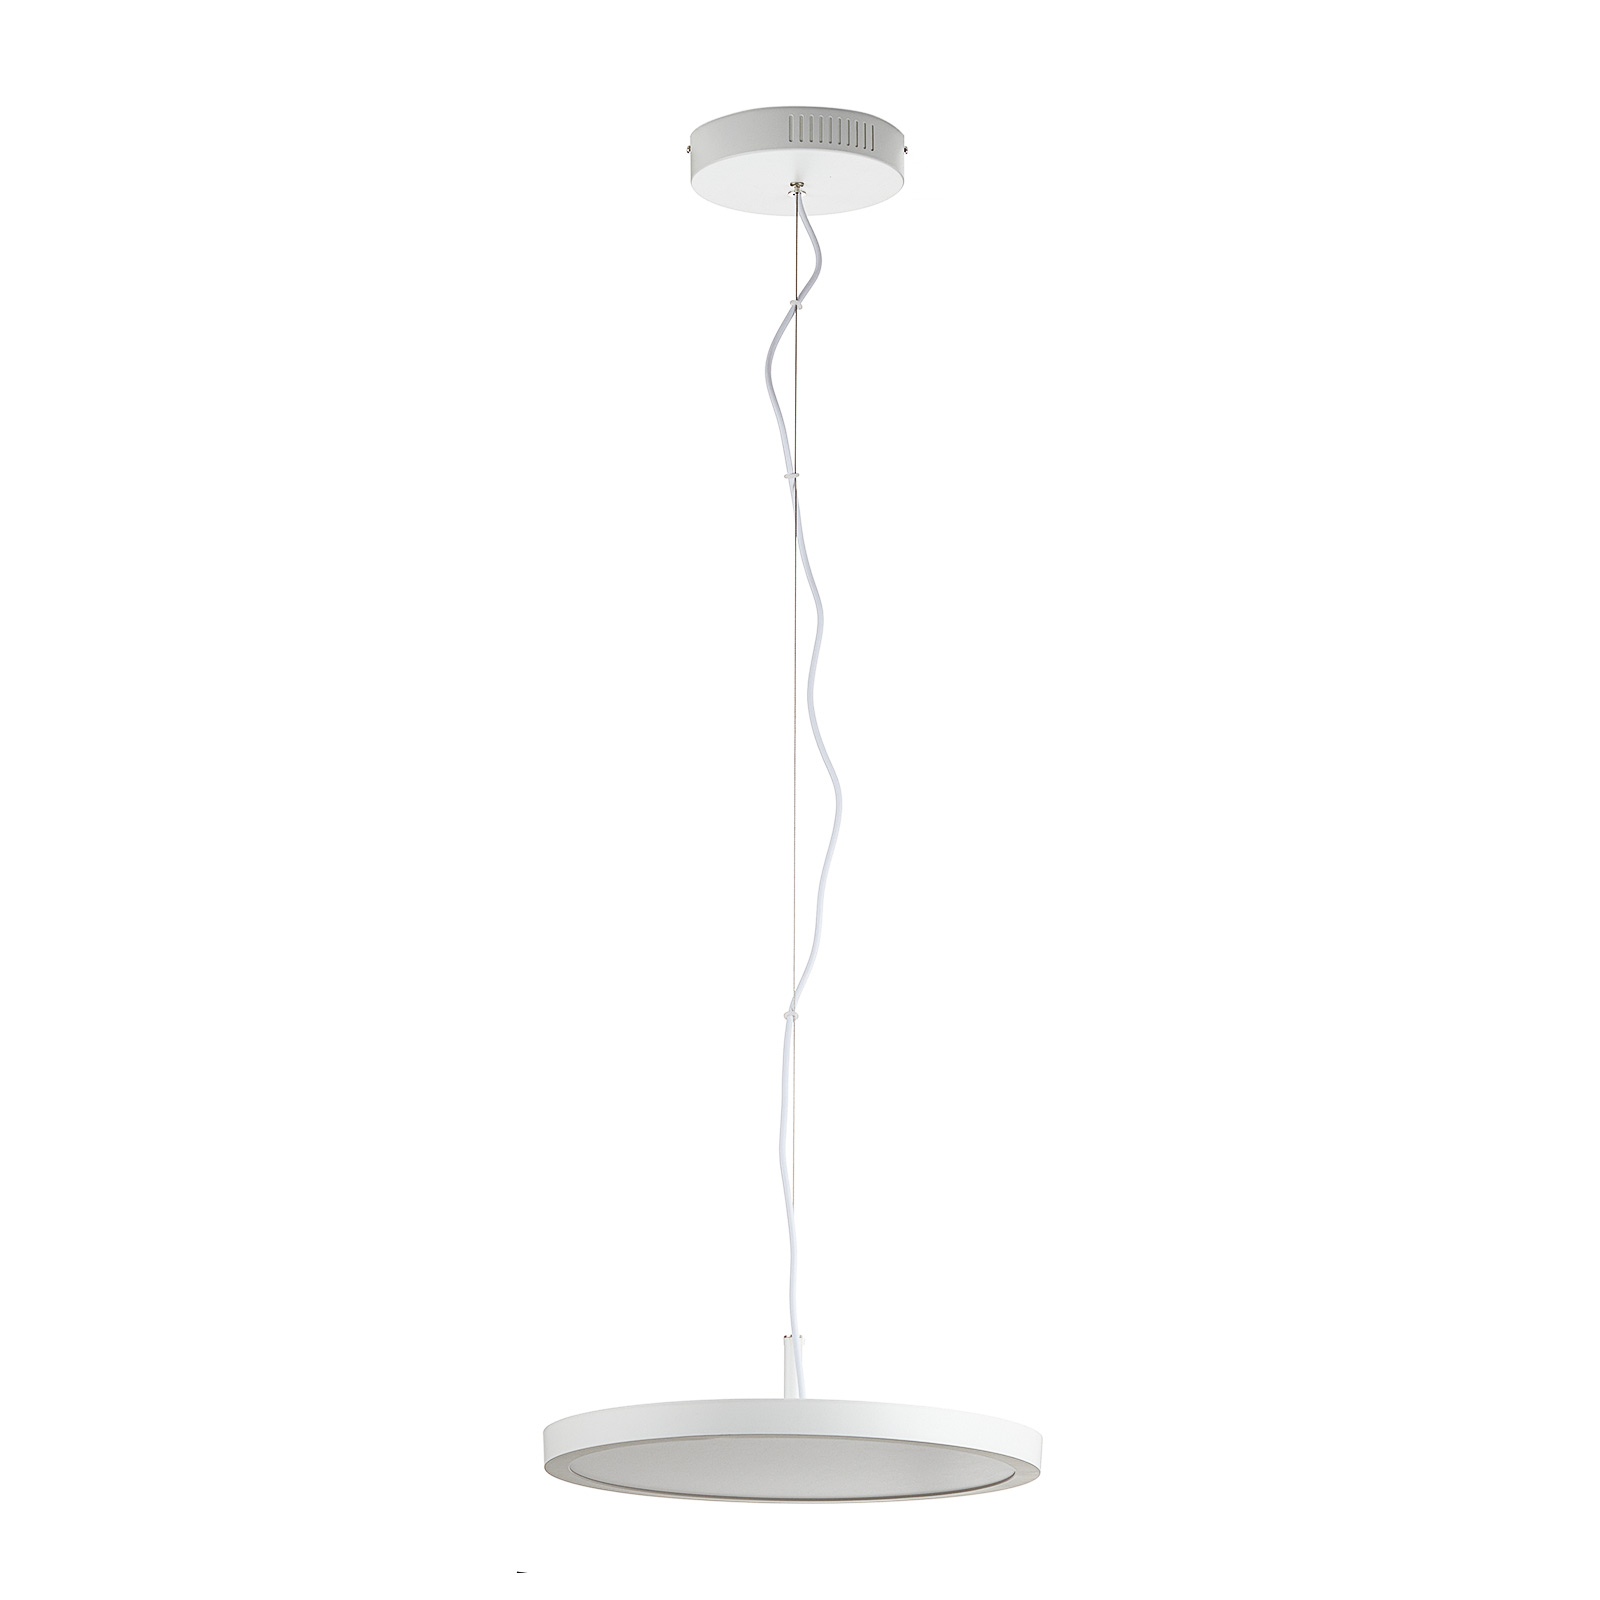 EGLO connect Cerignola-C lampa wisząca LED Ø 40 cm